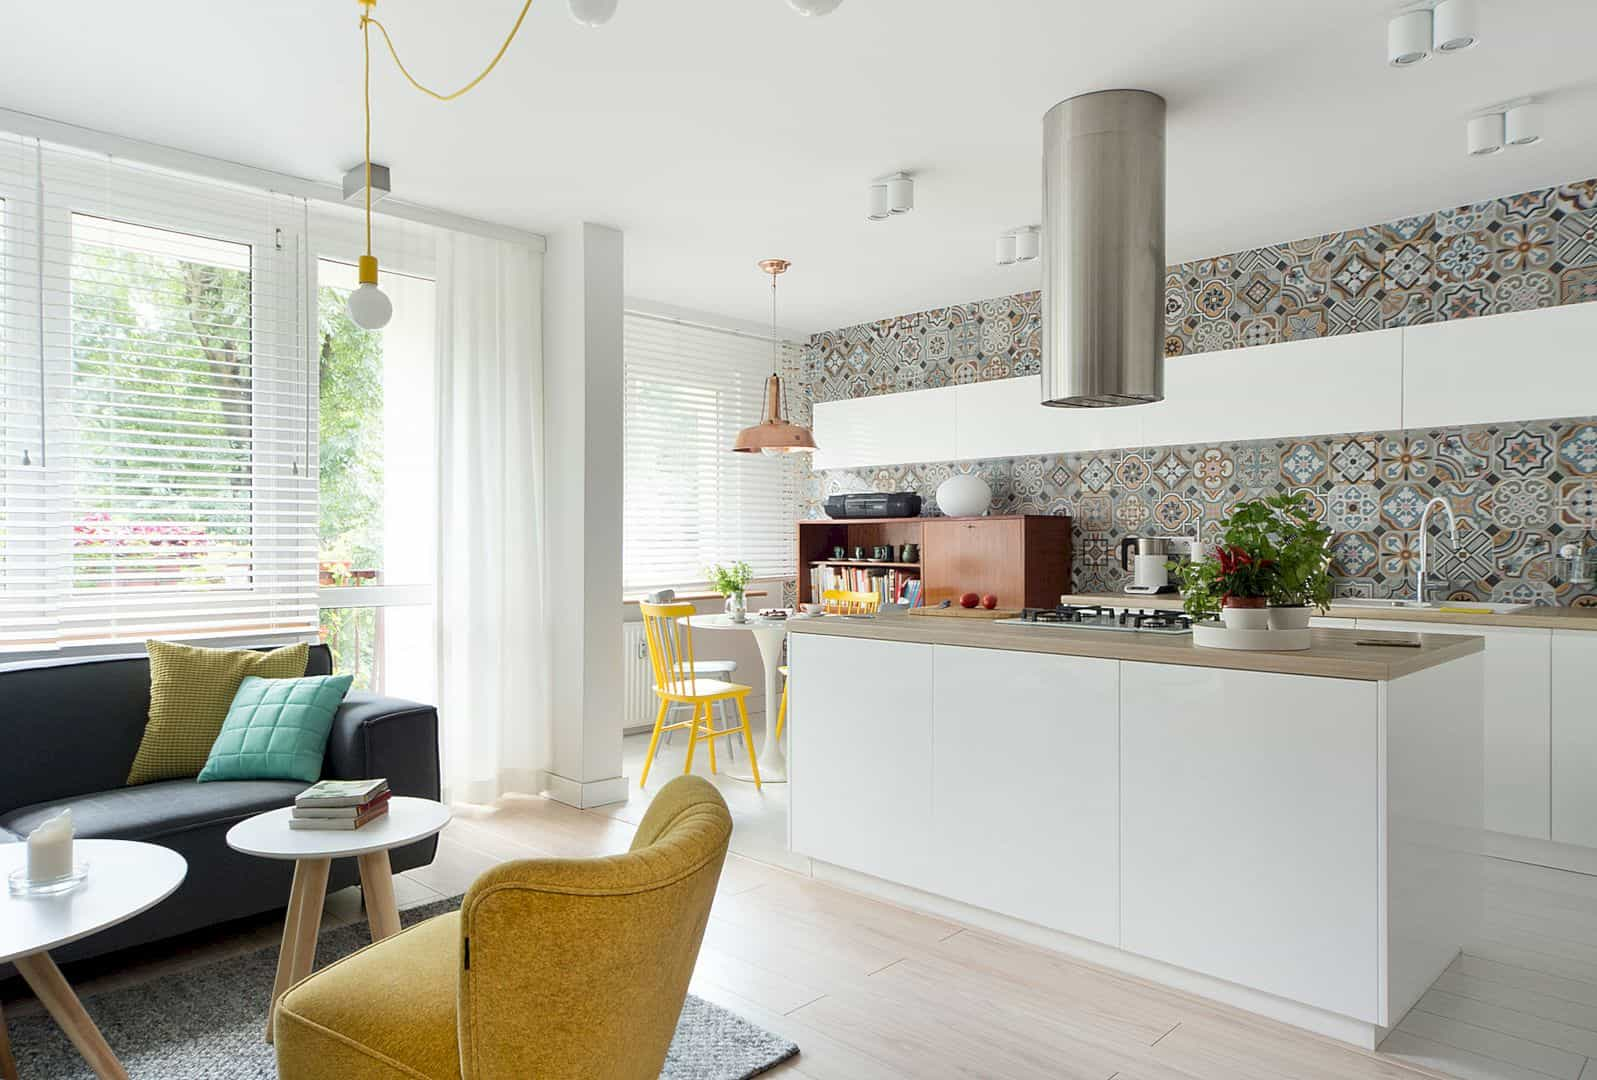 Mieszkanie Chorzow: A Colorful House with Bright and Contemporary Interior Design